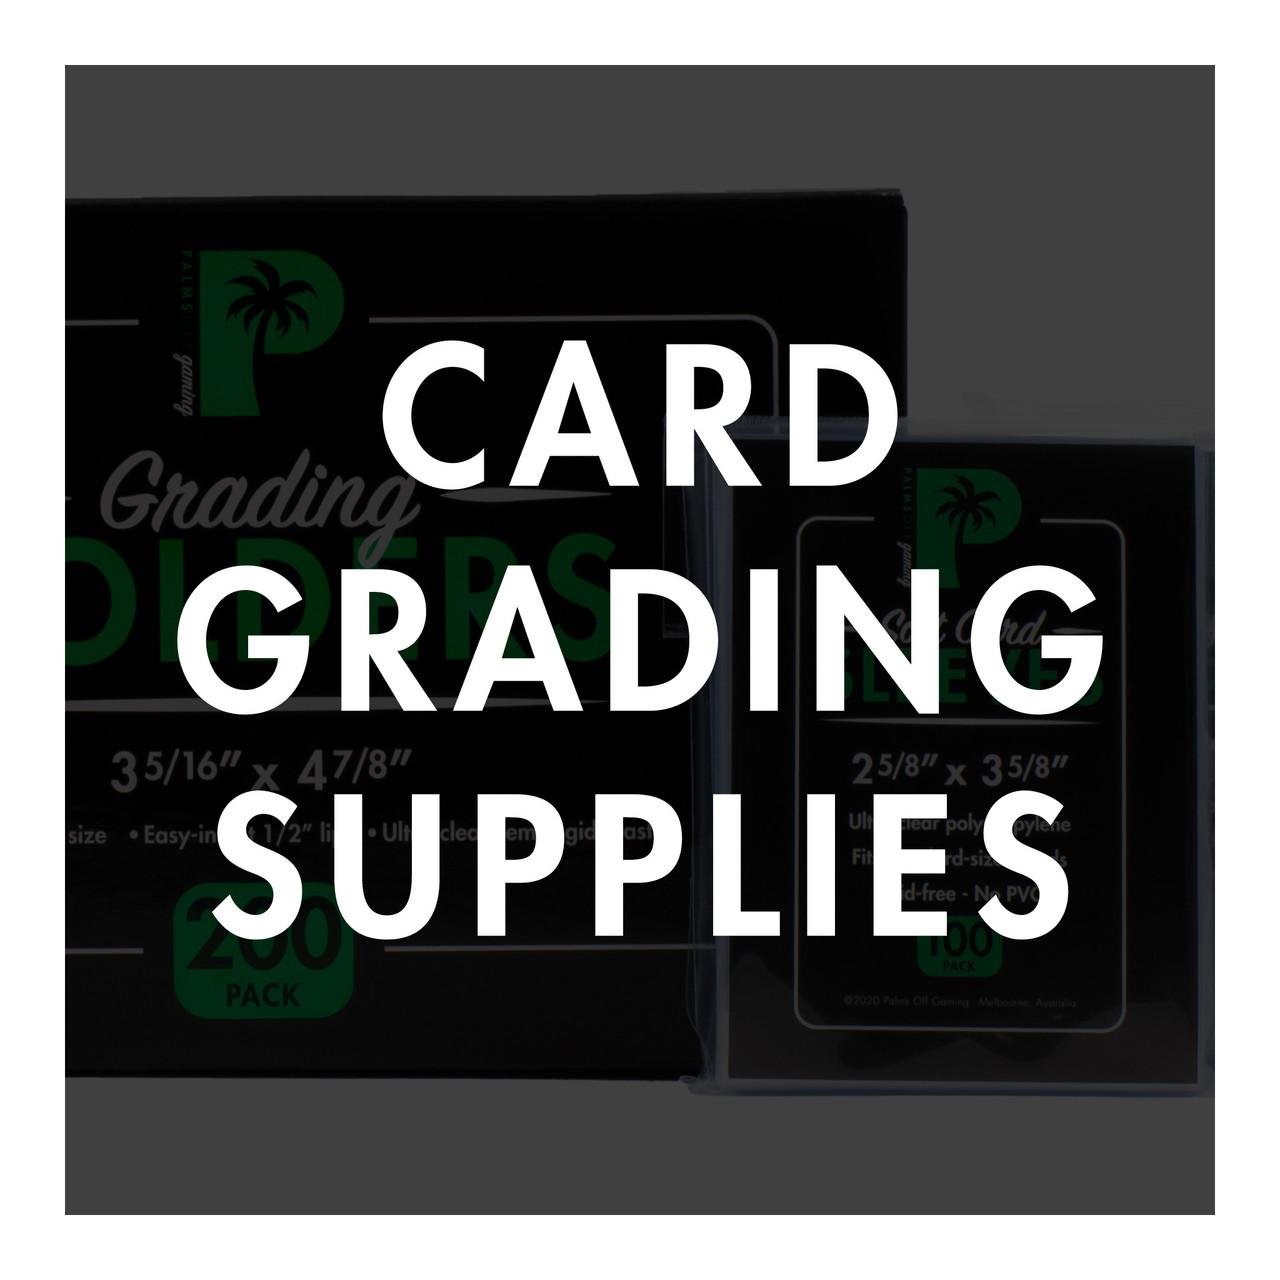 Card Grading Supplies